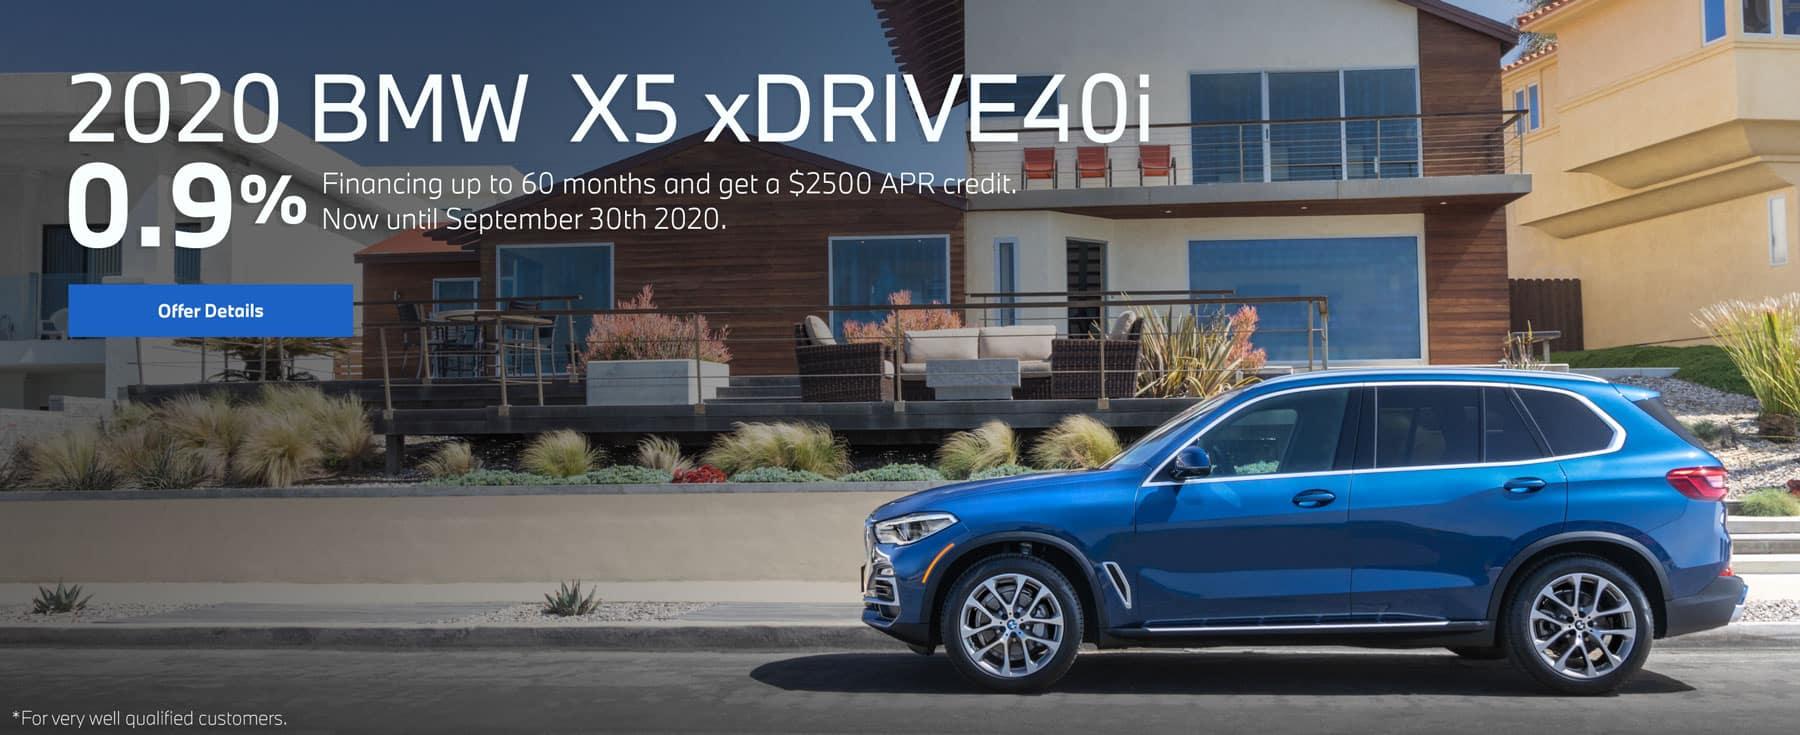 2020 bmw x5 xDrive40i 0.9% offer